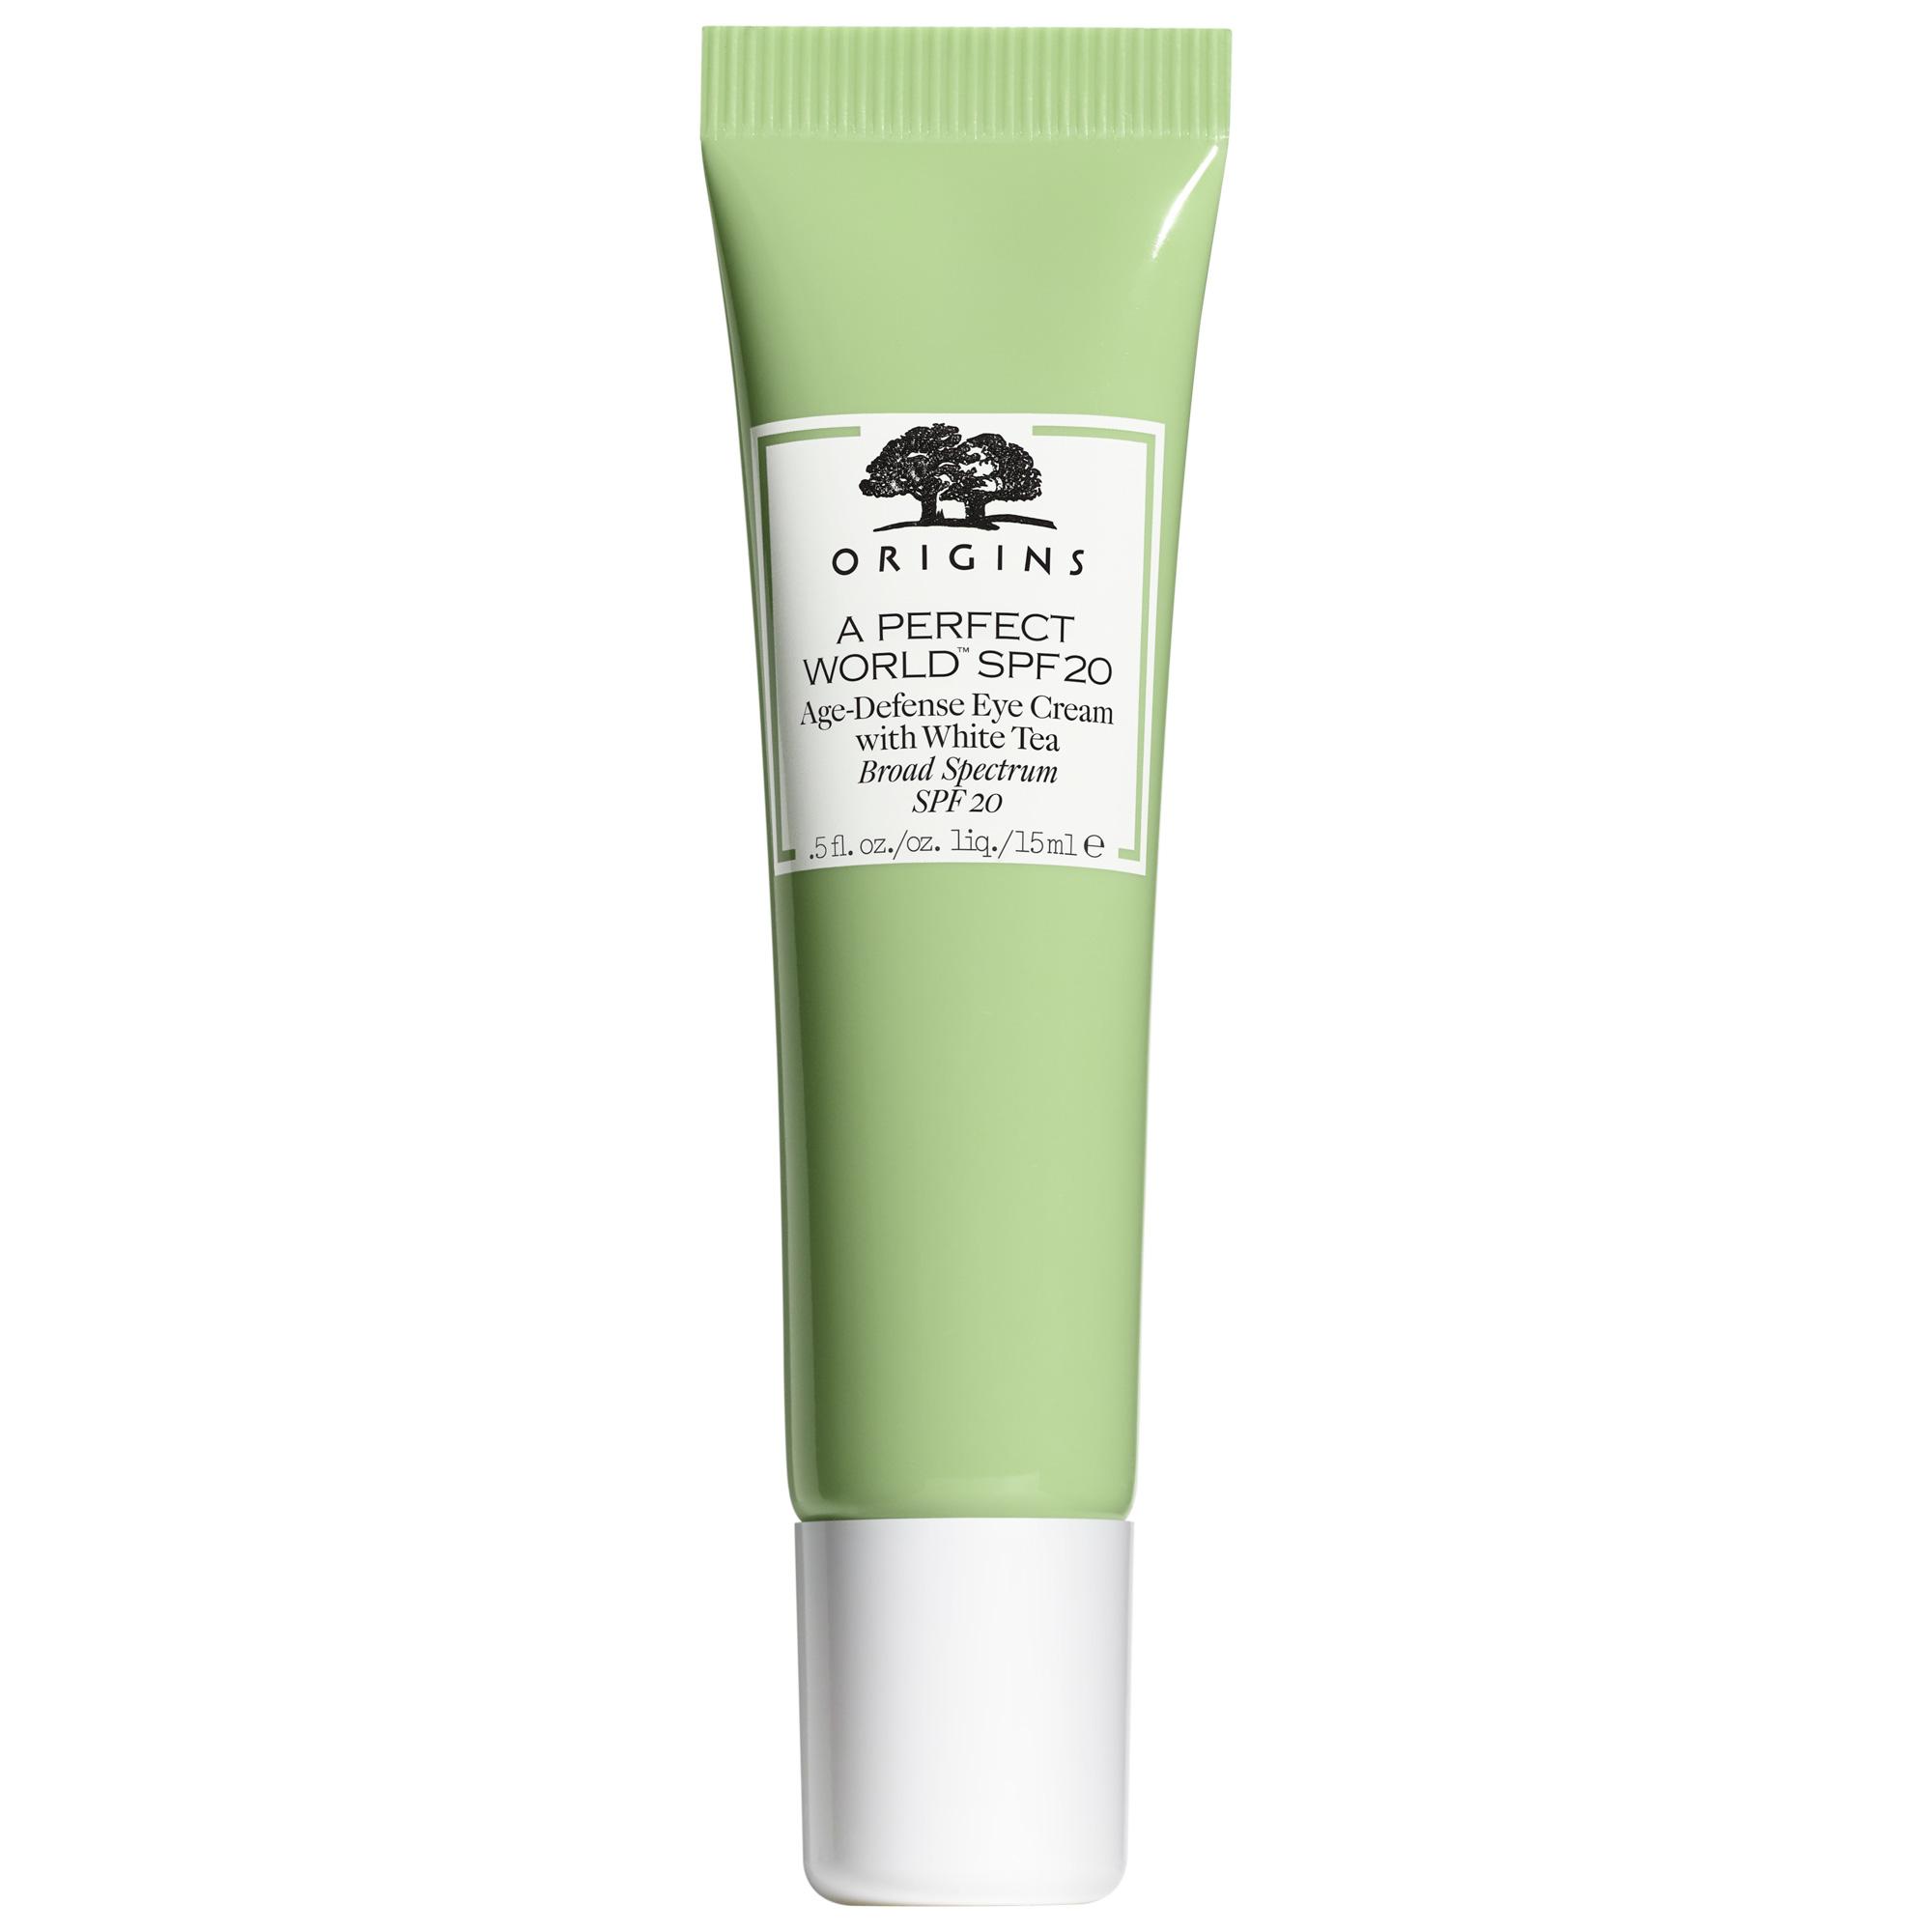 A Perfect World™ SPF 20 Age-Defense Eye Cream with White Tea